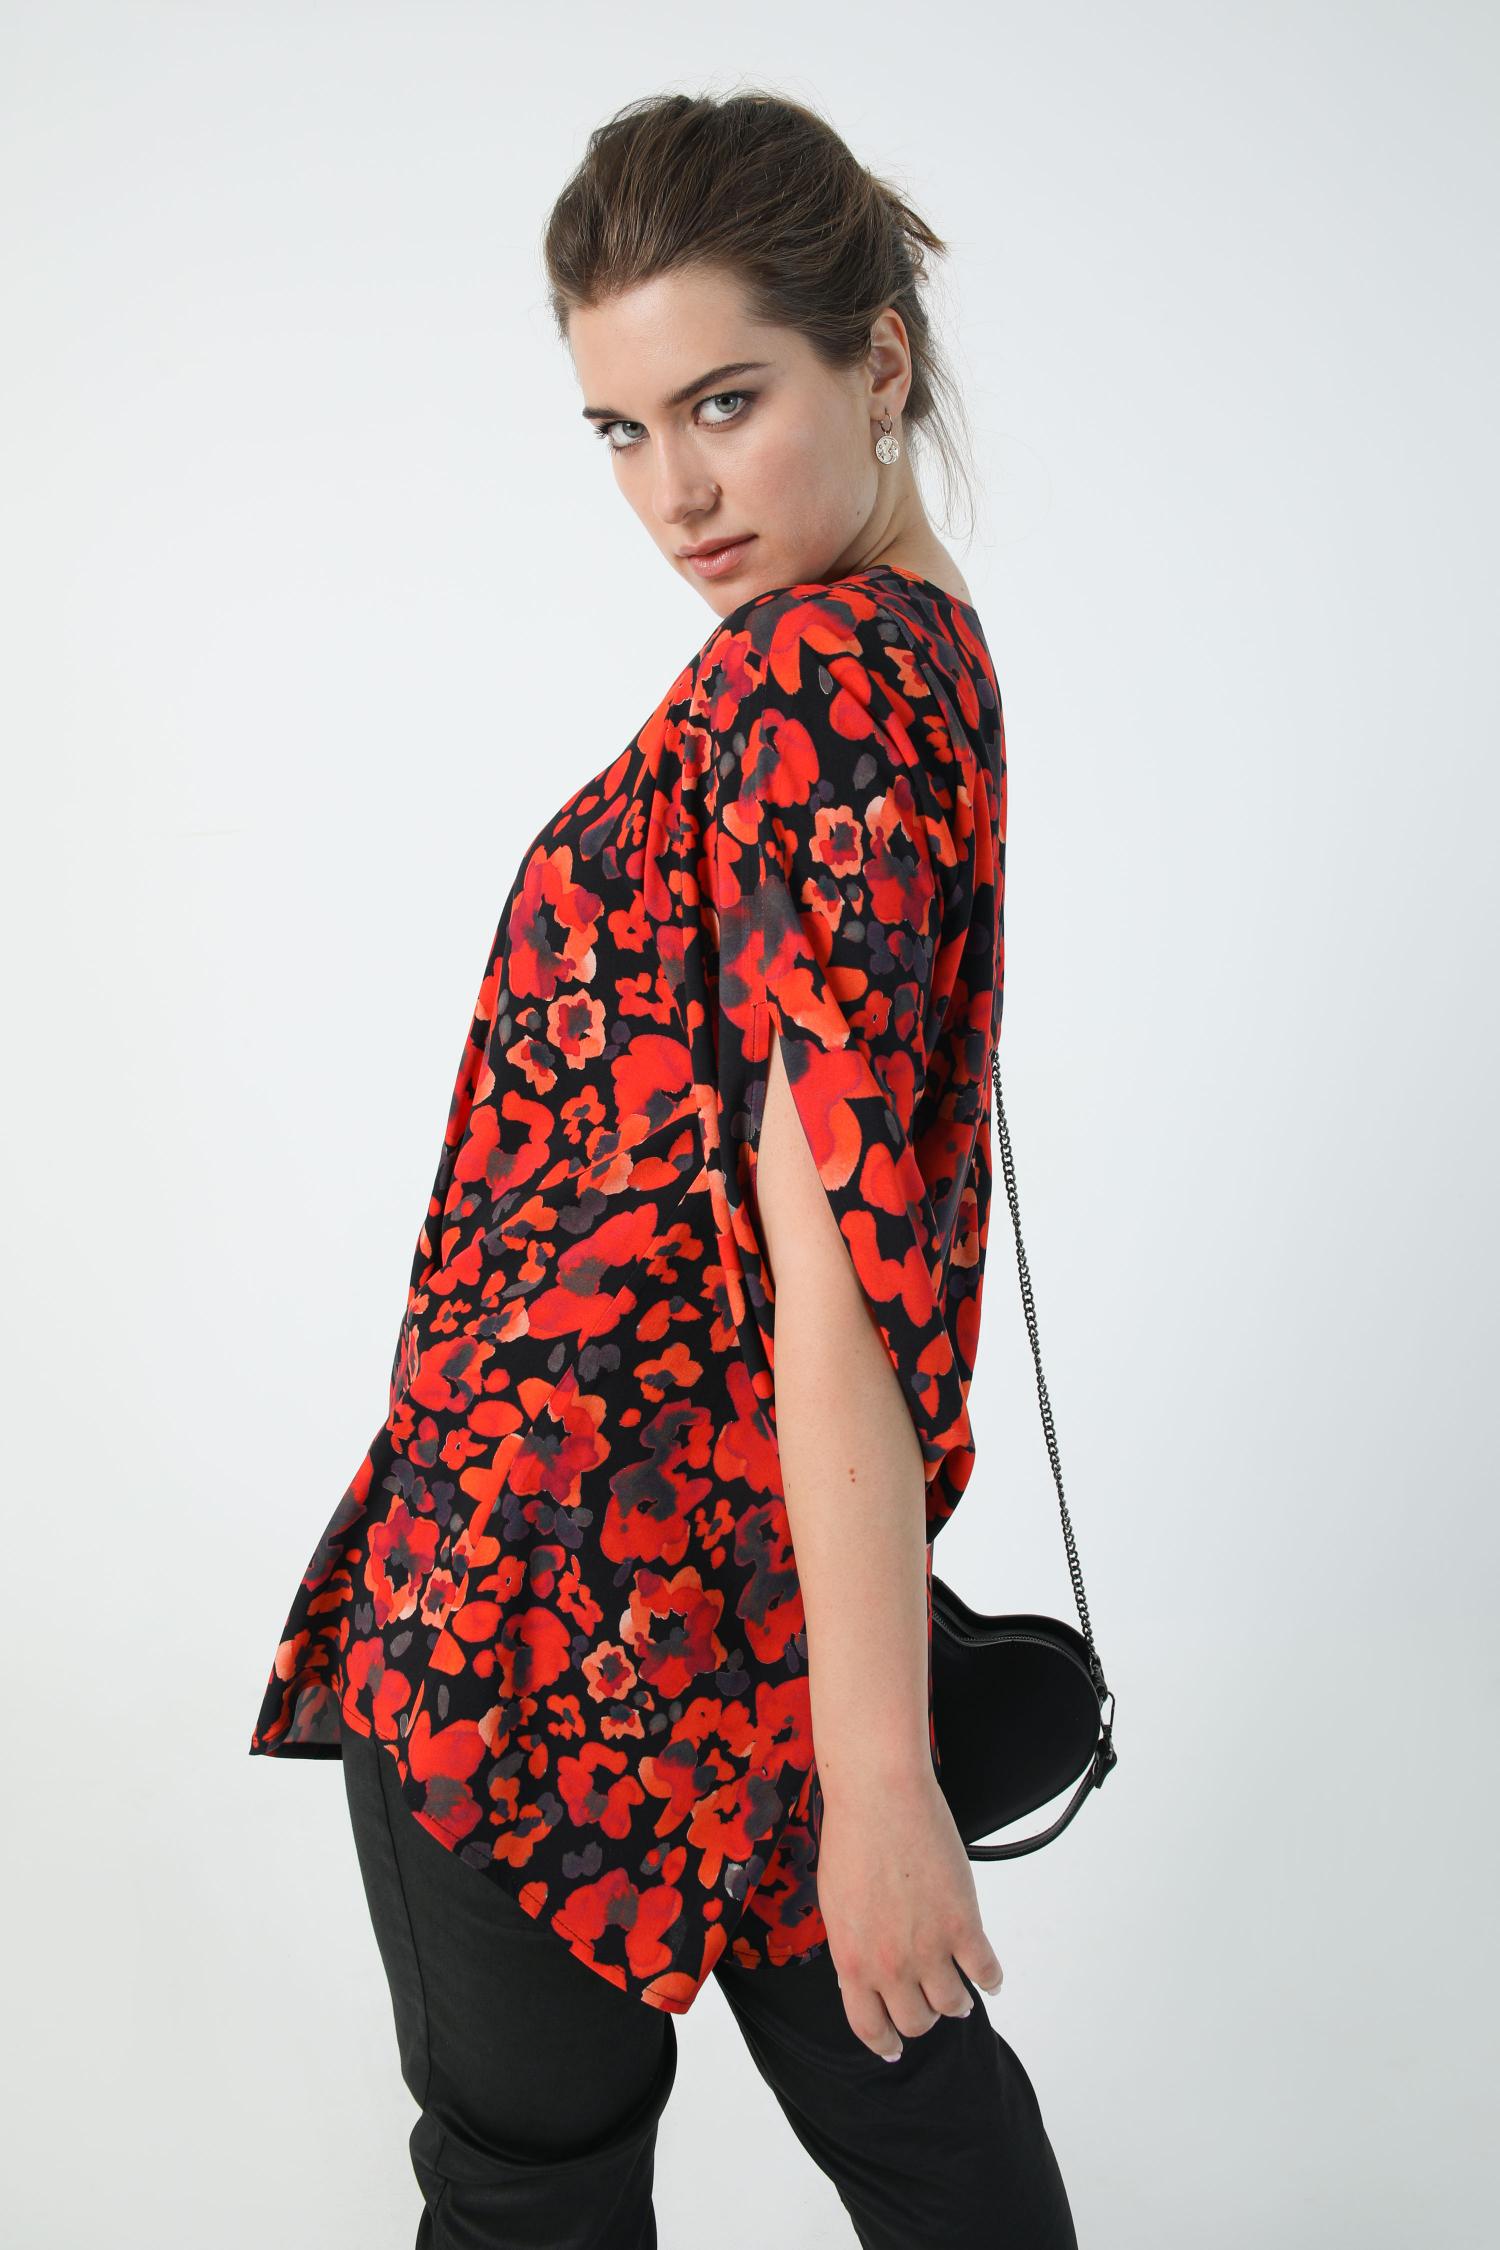 Printed tunic with zipped neckline Oeko-tex fabric